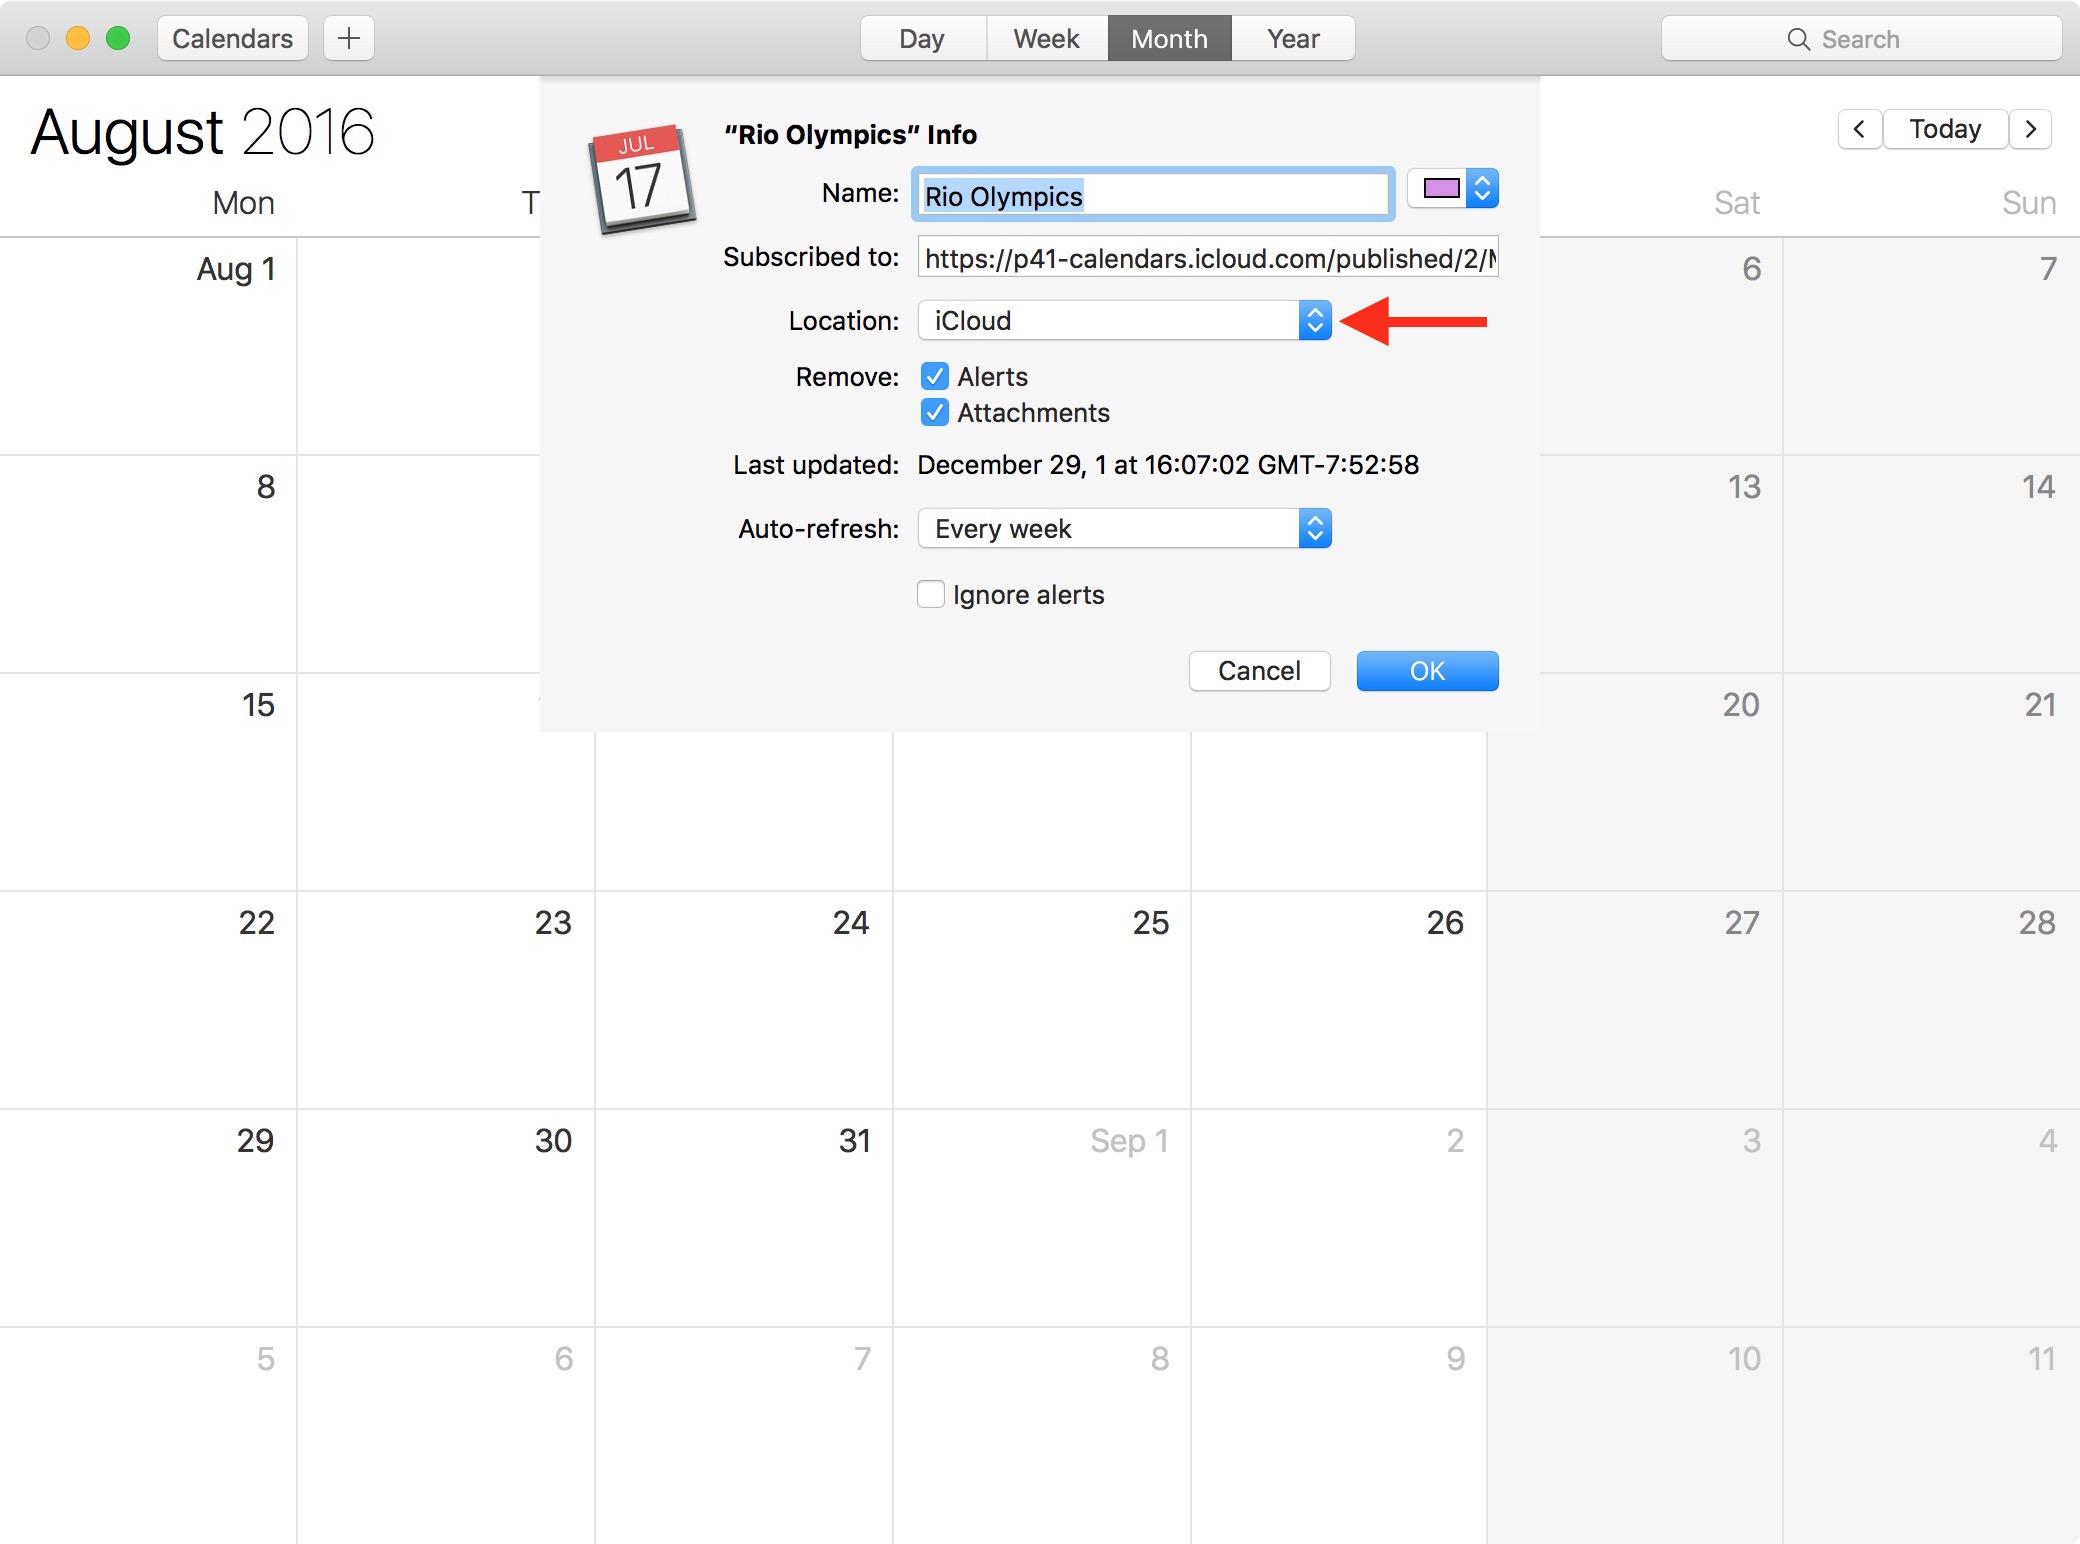 2016 Rio Olympics calendar Mac 2